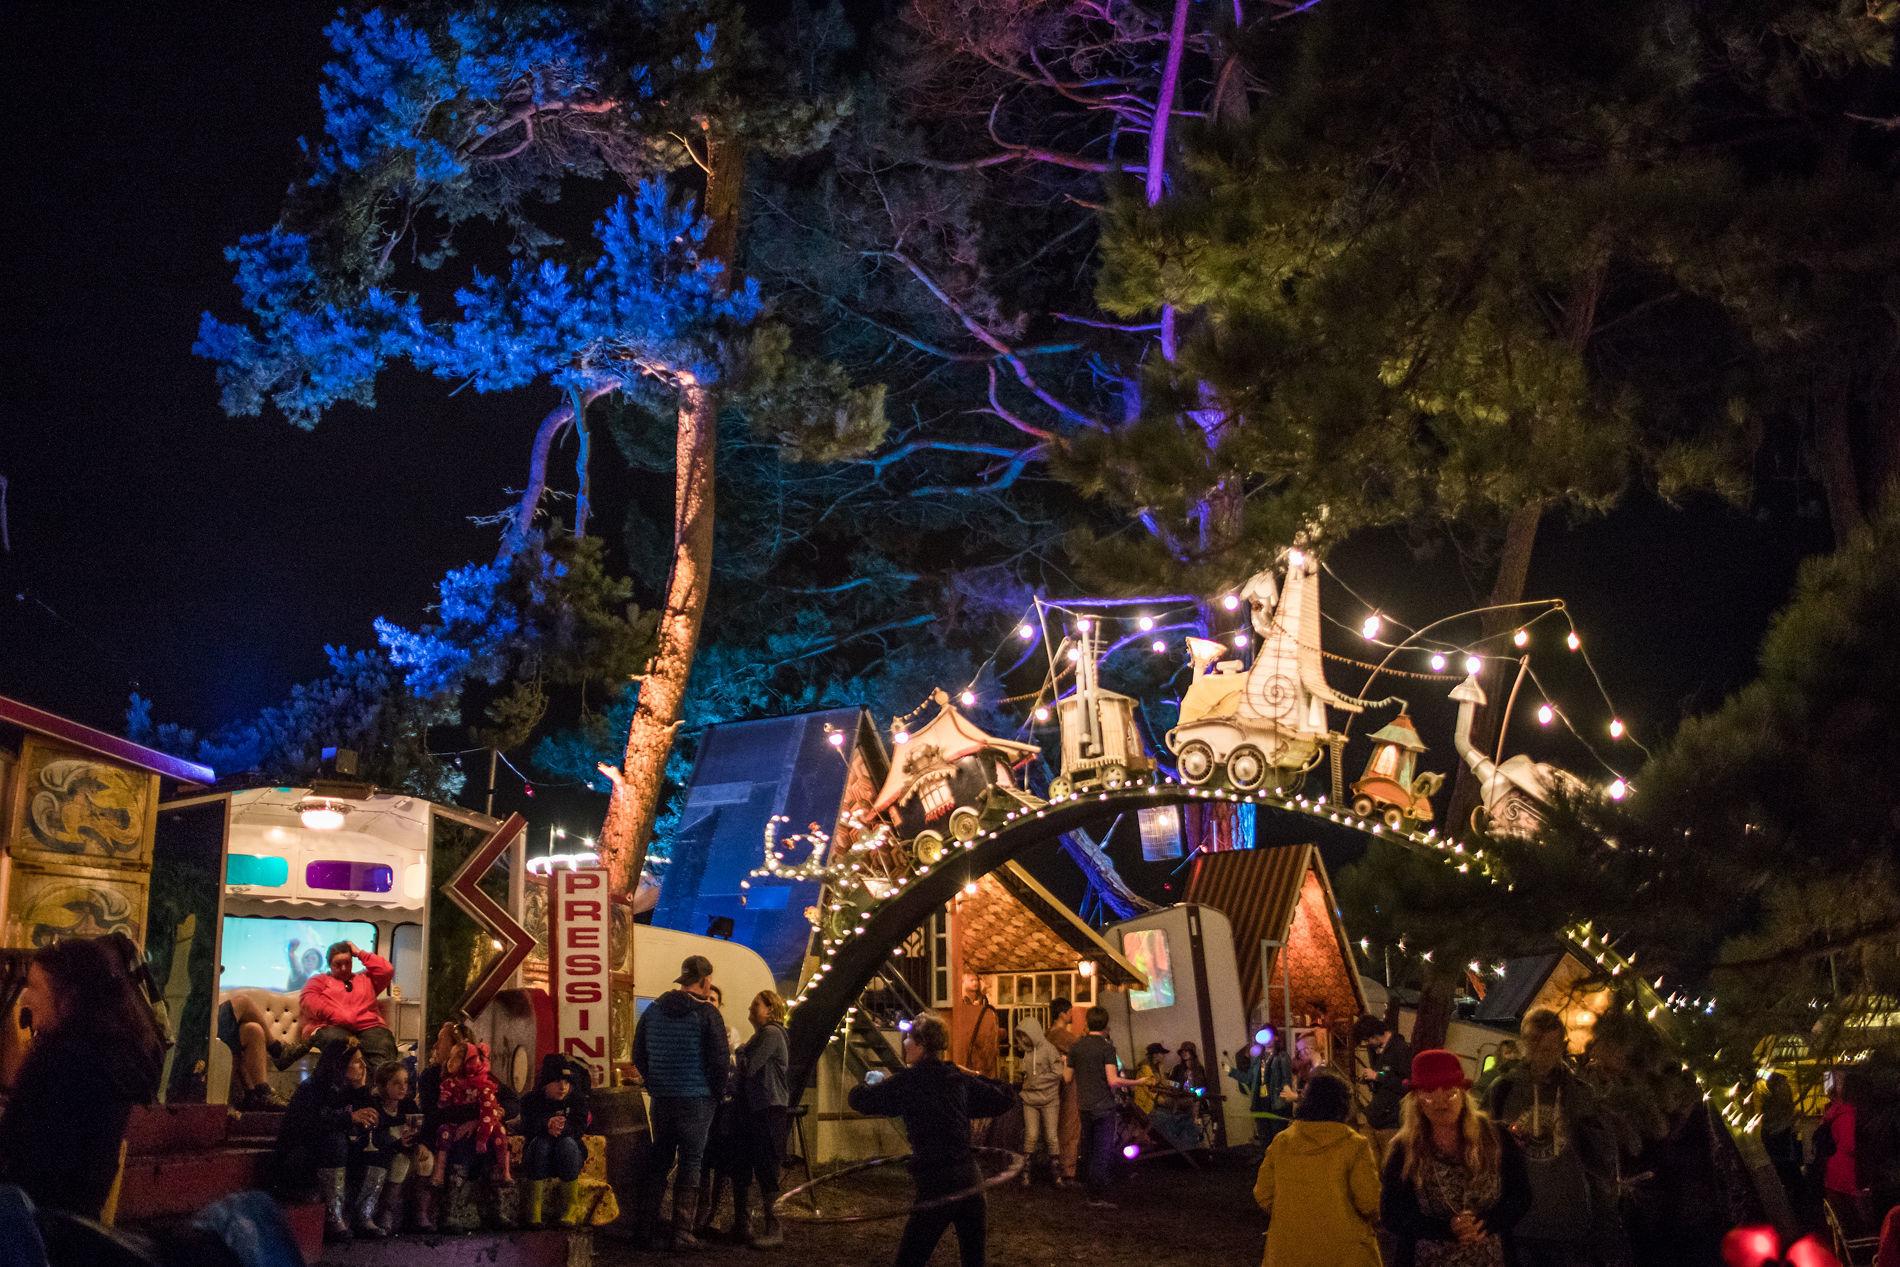 103-CampBestival2017-DisneyRascal-CL-VIC_8002.jpg